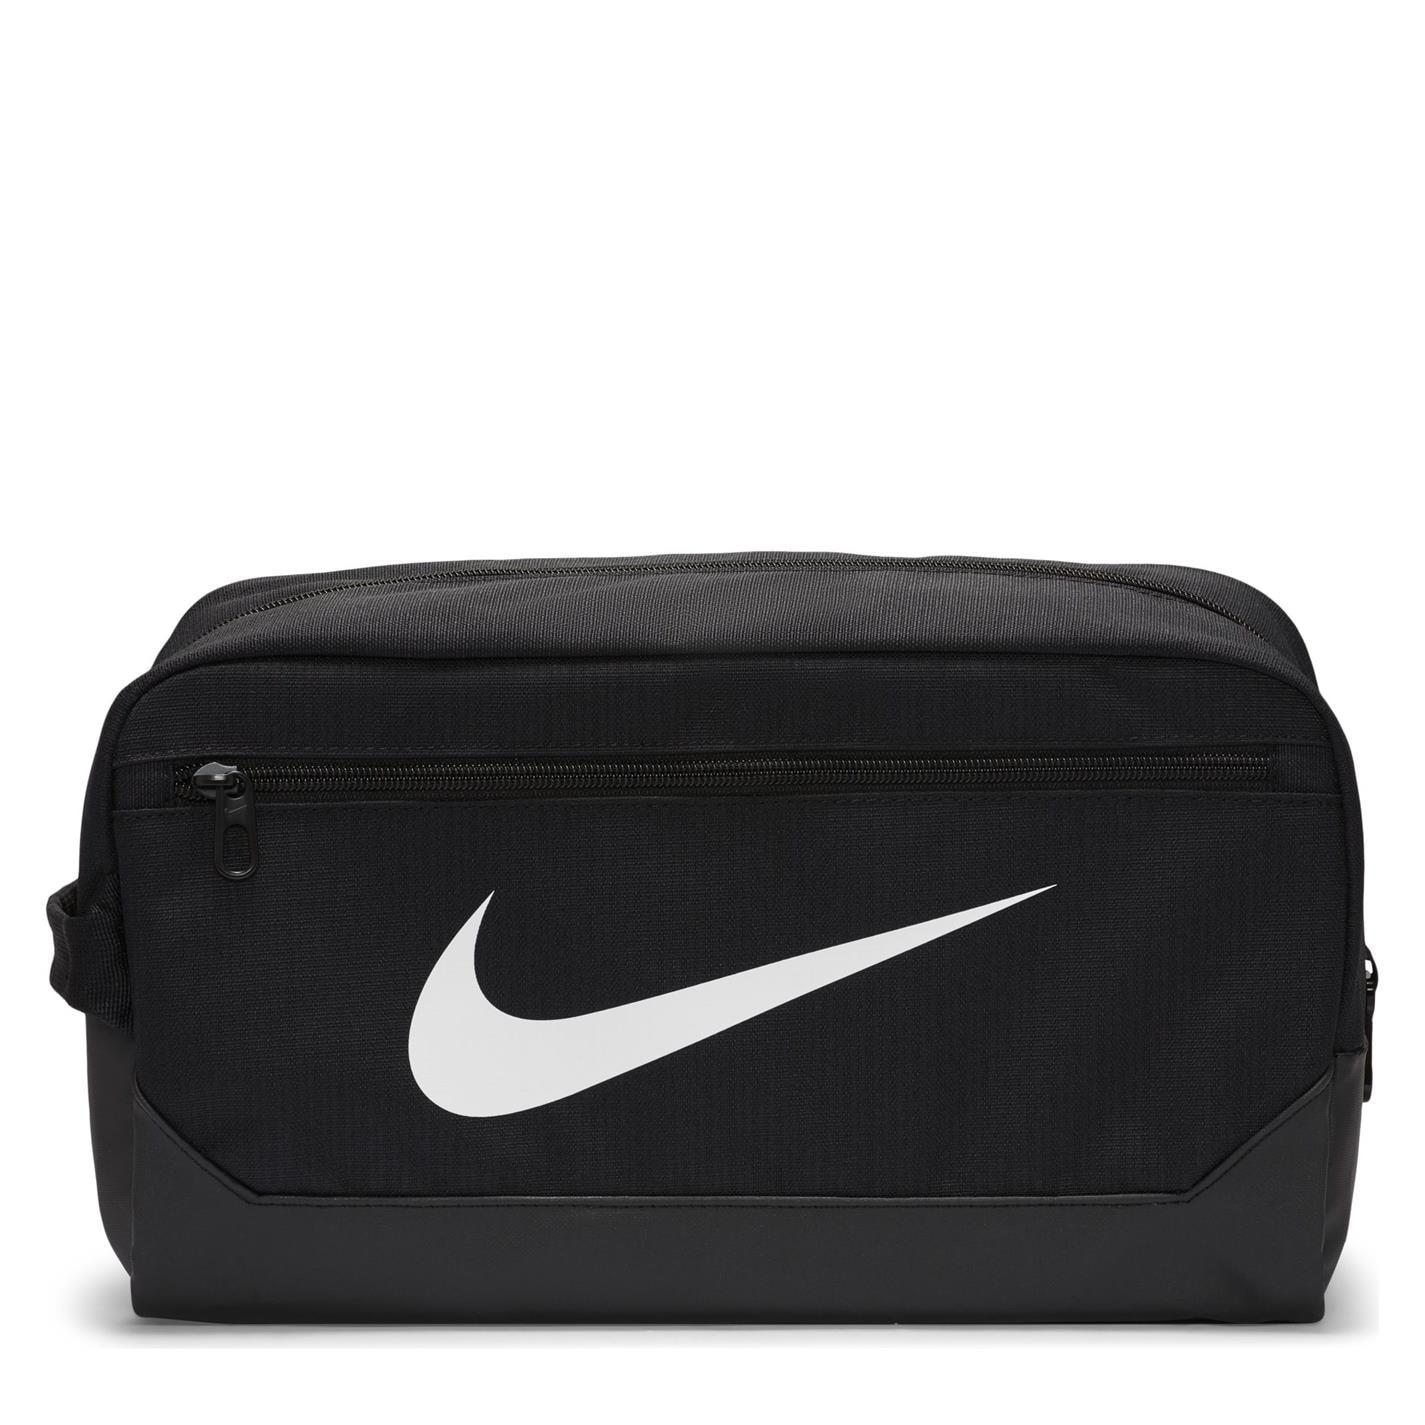 Nike Brasilia Shoebag Black